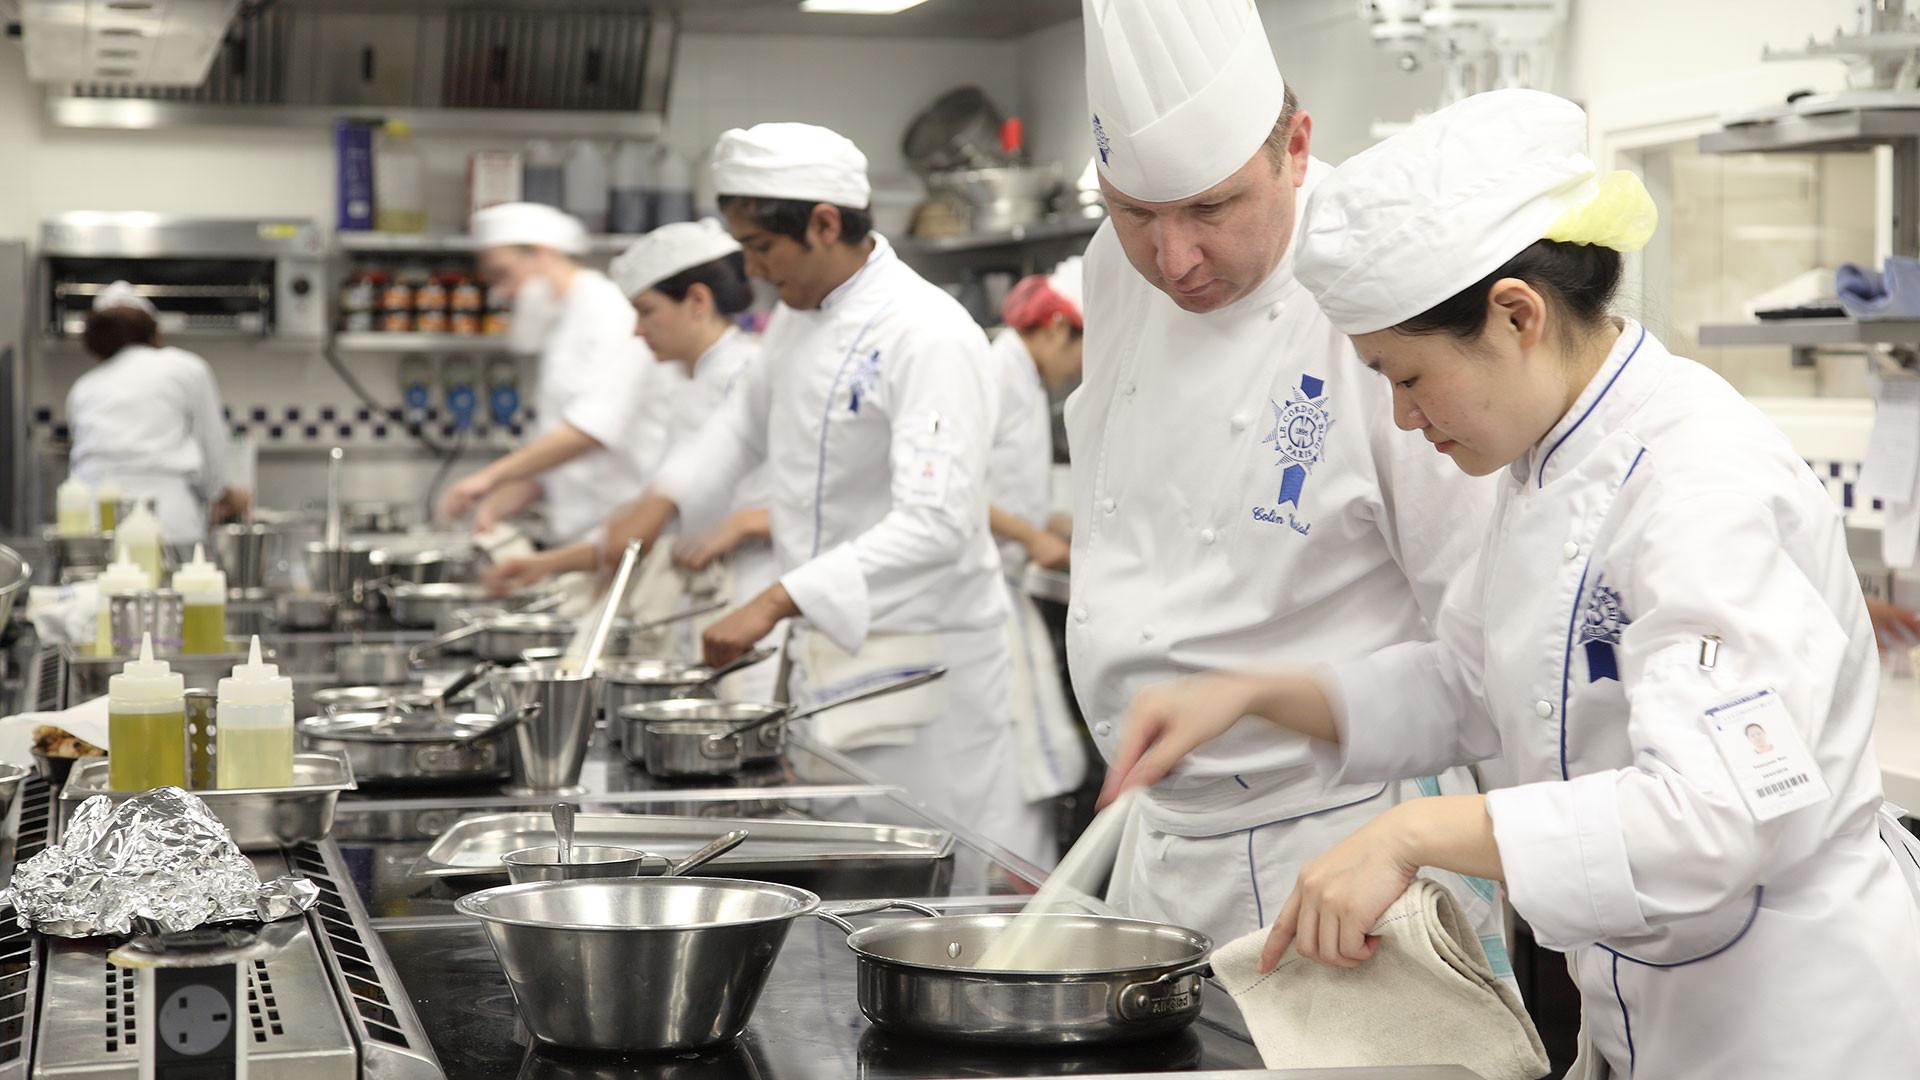 Cooks in Le Cordon Bleu's kitchens